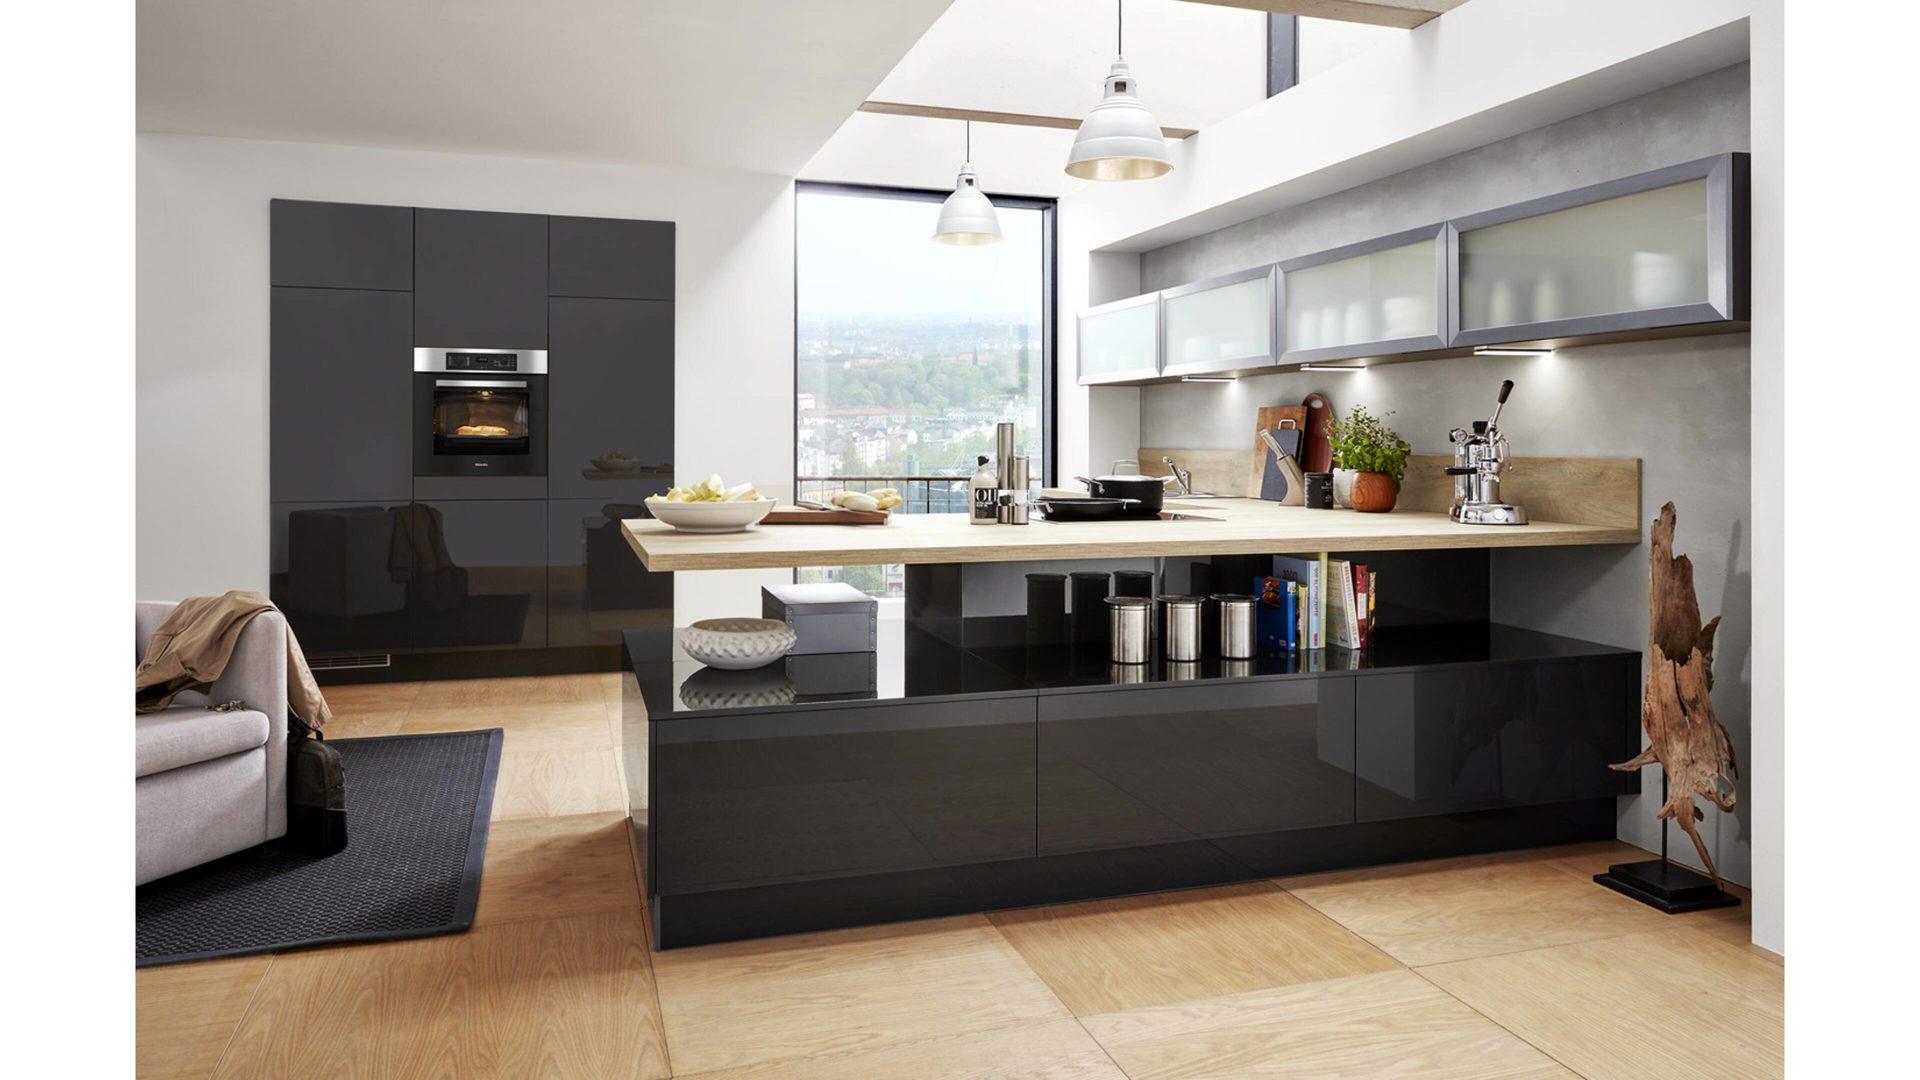 Möbel Boer Coesfeld, Räume, Küche, Einbauküche, Culineo, Culineo ...